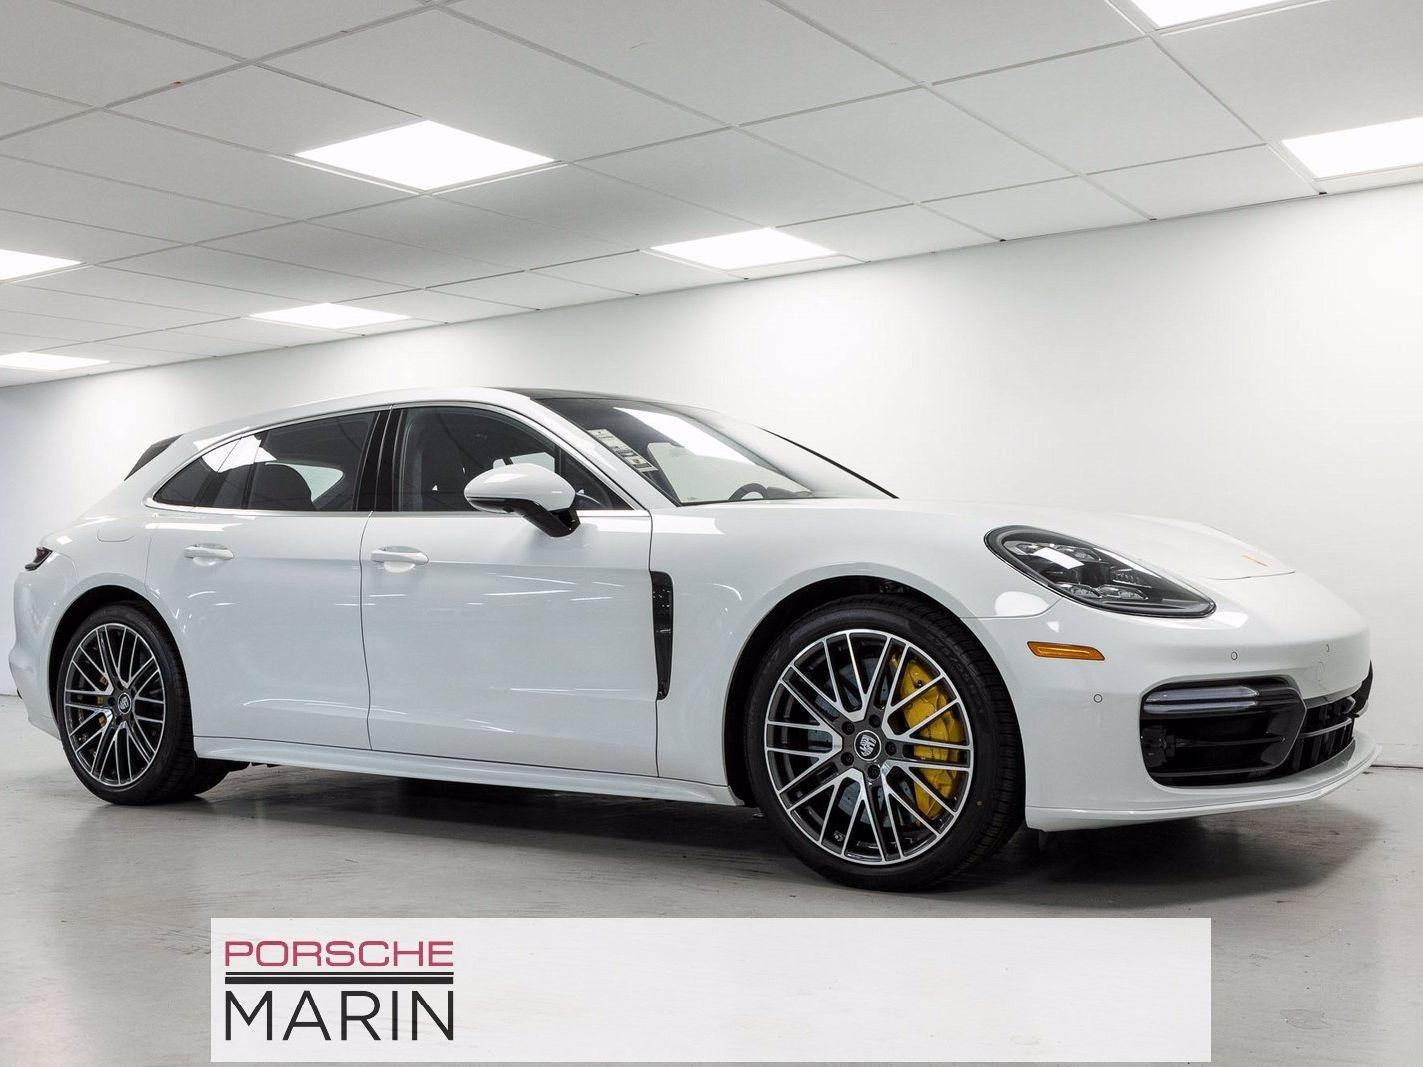 2021 Porsche Panamera Turbo S Sport Turismo – 1